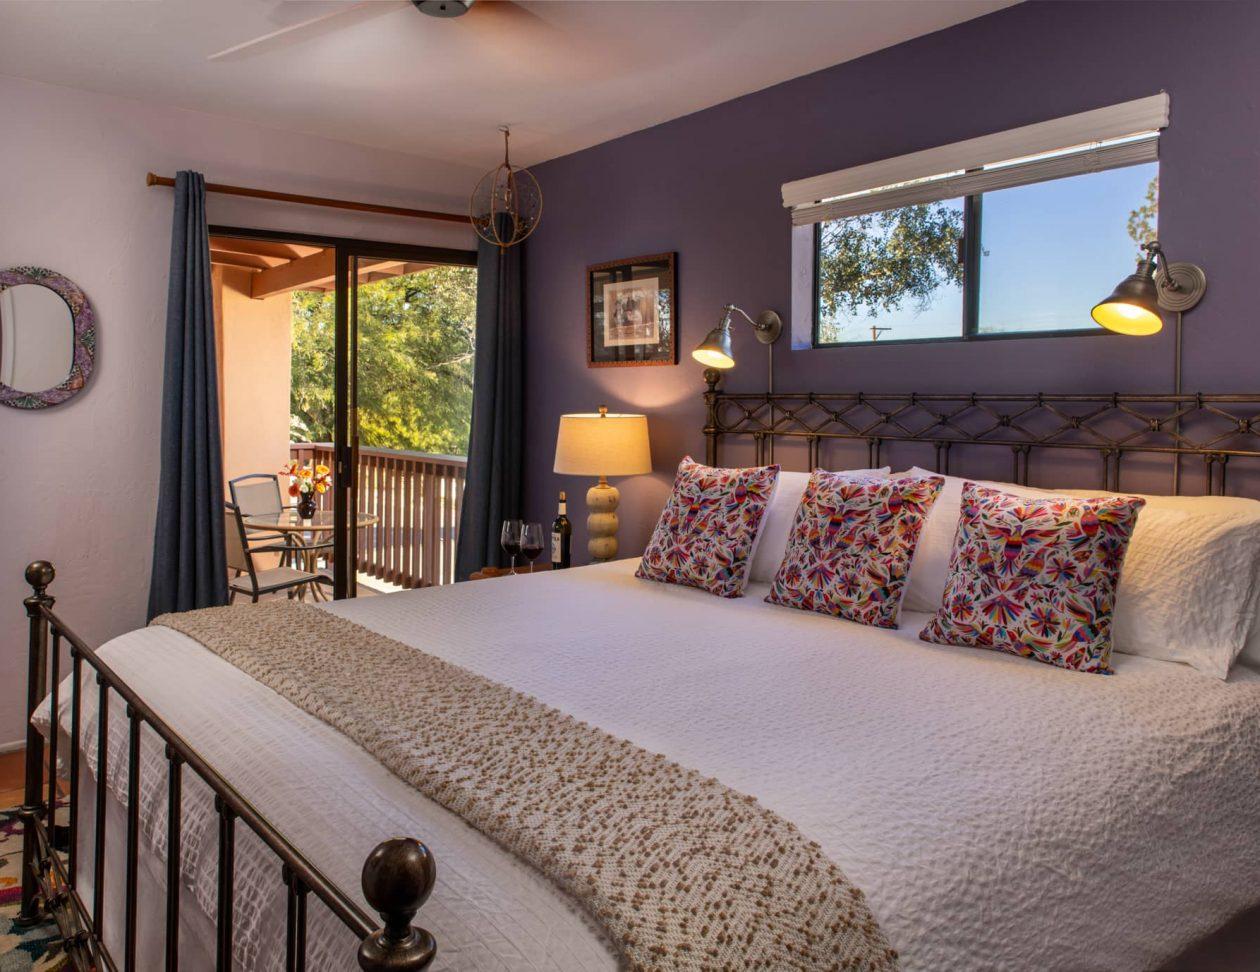 King sized bed in the Santa Rita Suite at Adobe Rose Inn